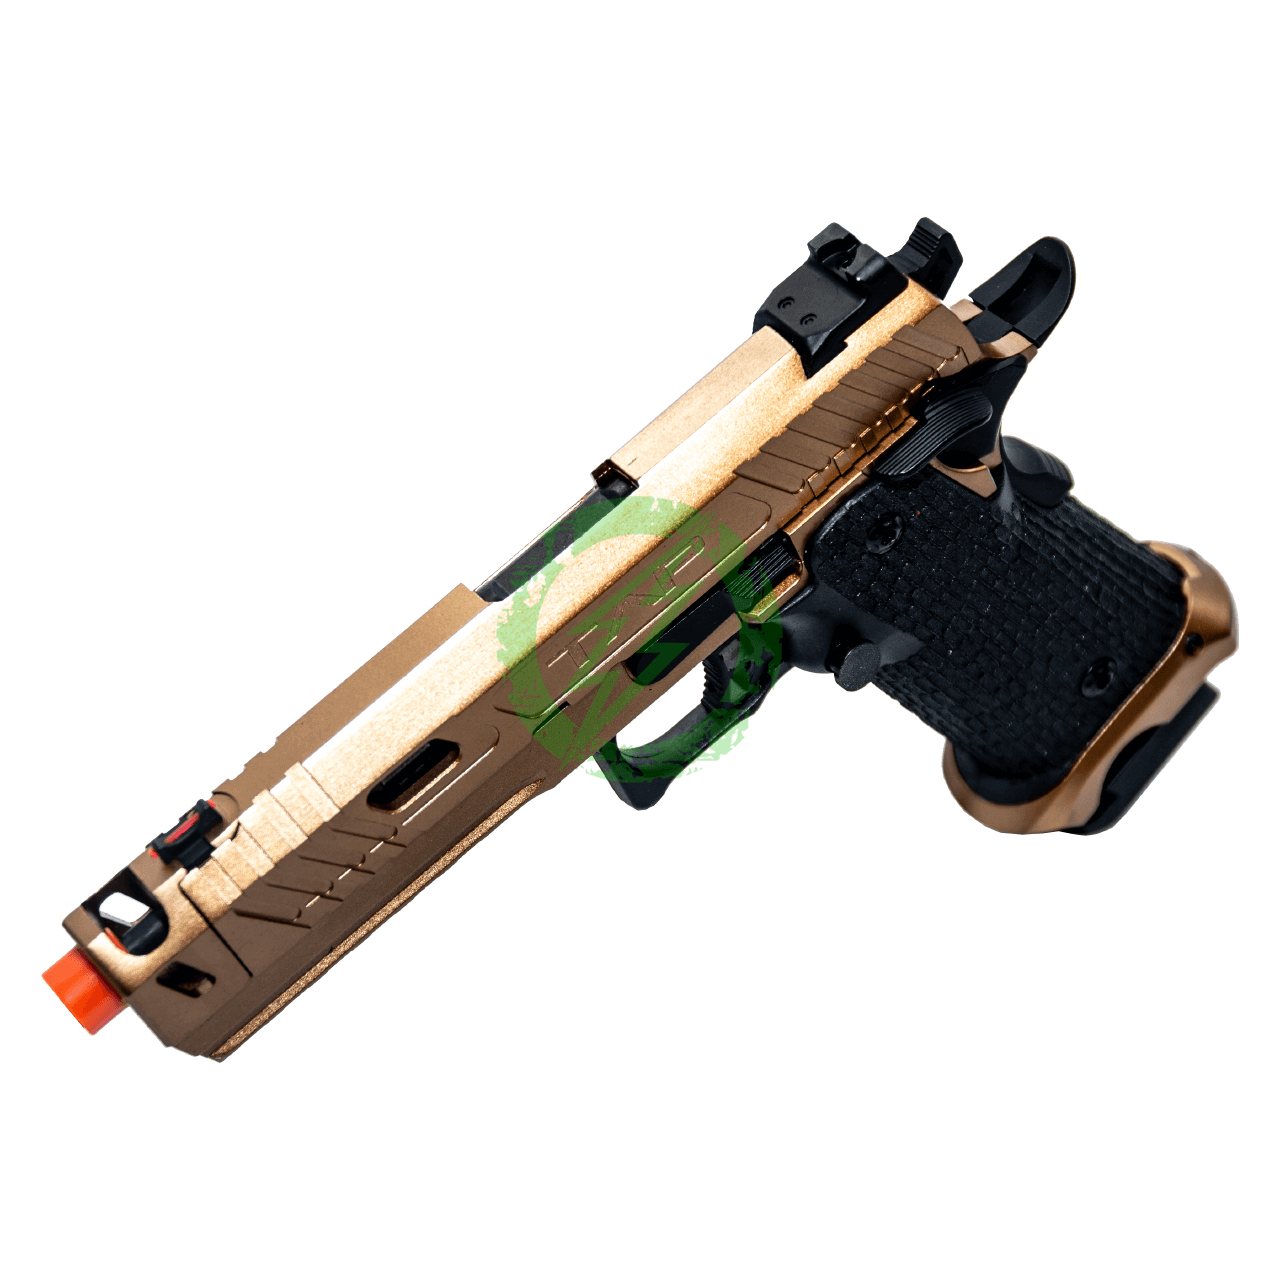 ECHO 1 TAP Gas Blow Back Pistol | Bronze left